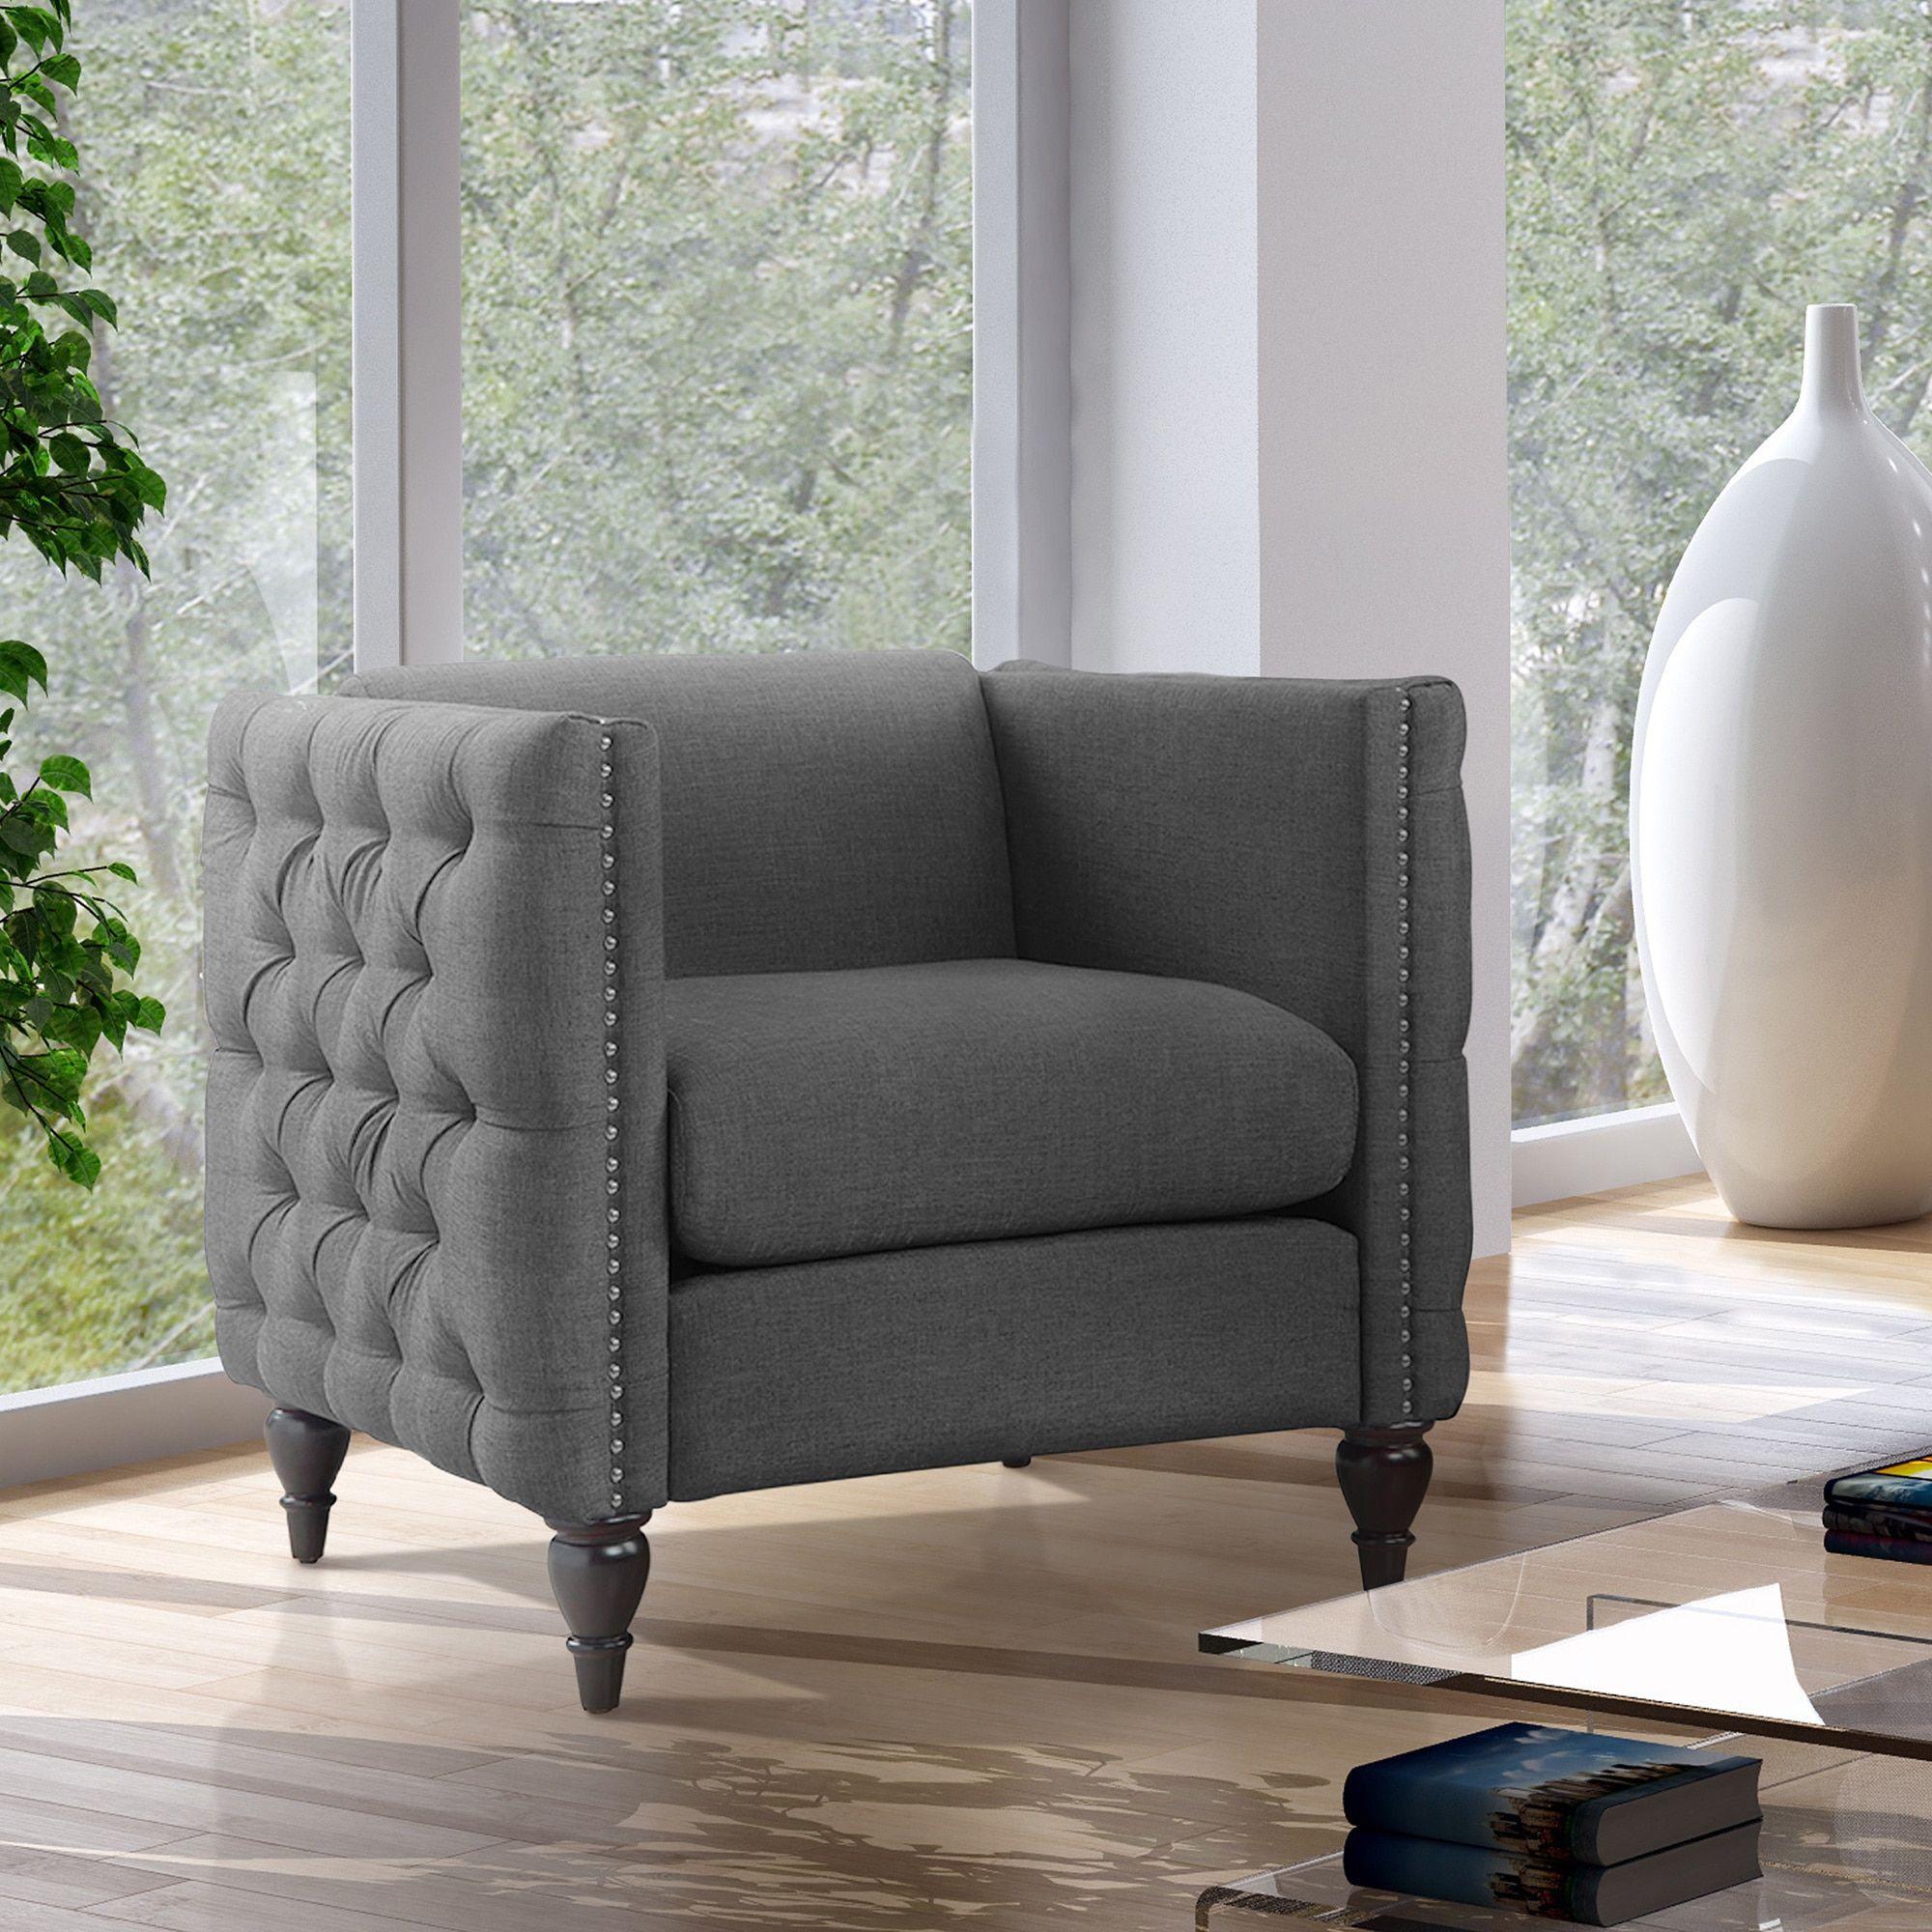 Cheap Furniture Stores Online Free Shipping: Furniture Of America Clara Tuxedo Linen Tufted Nailhead